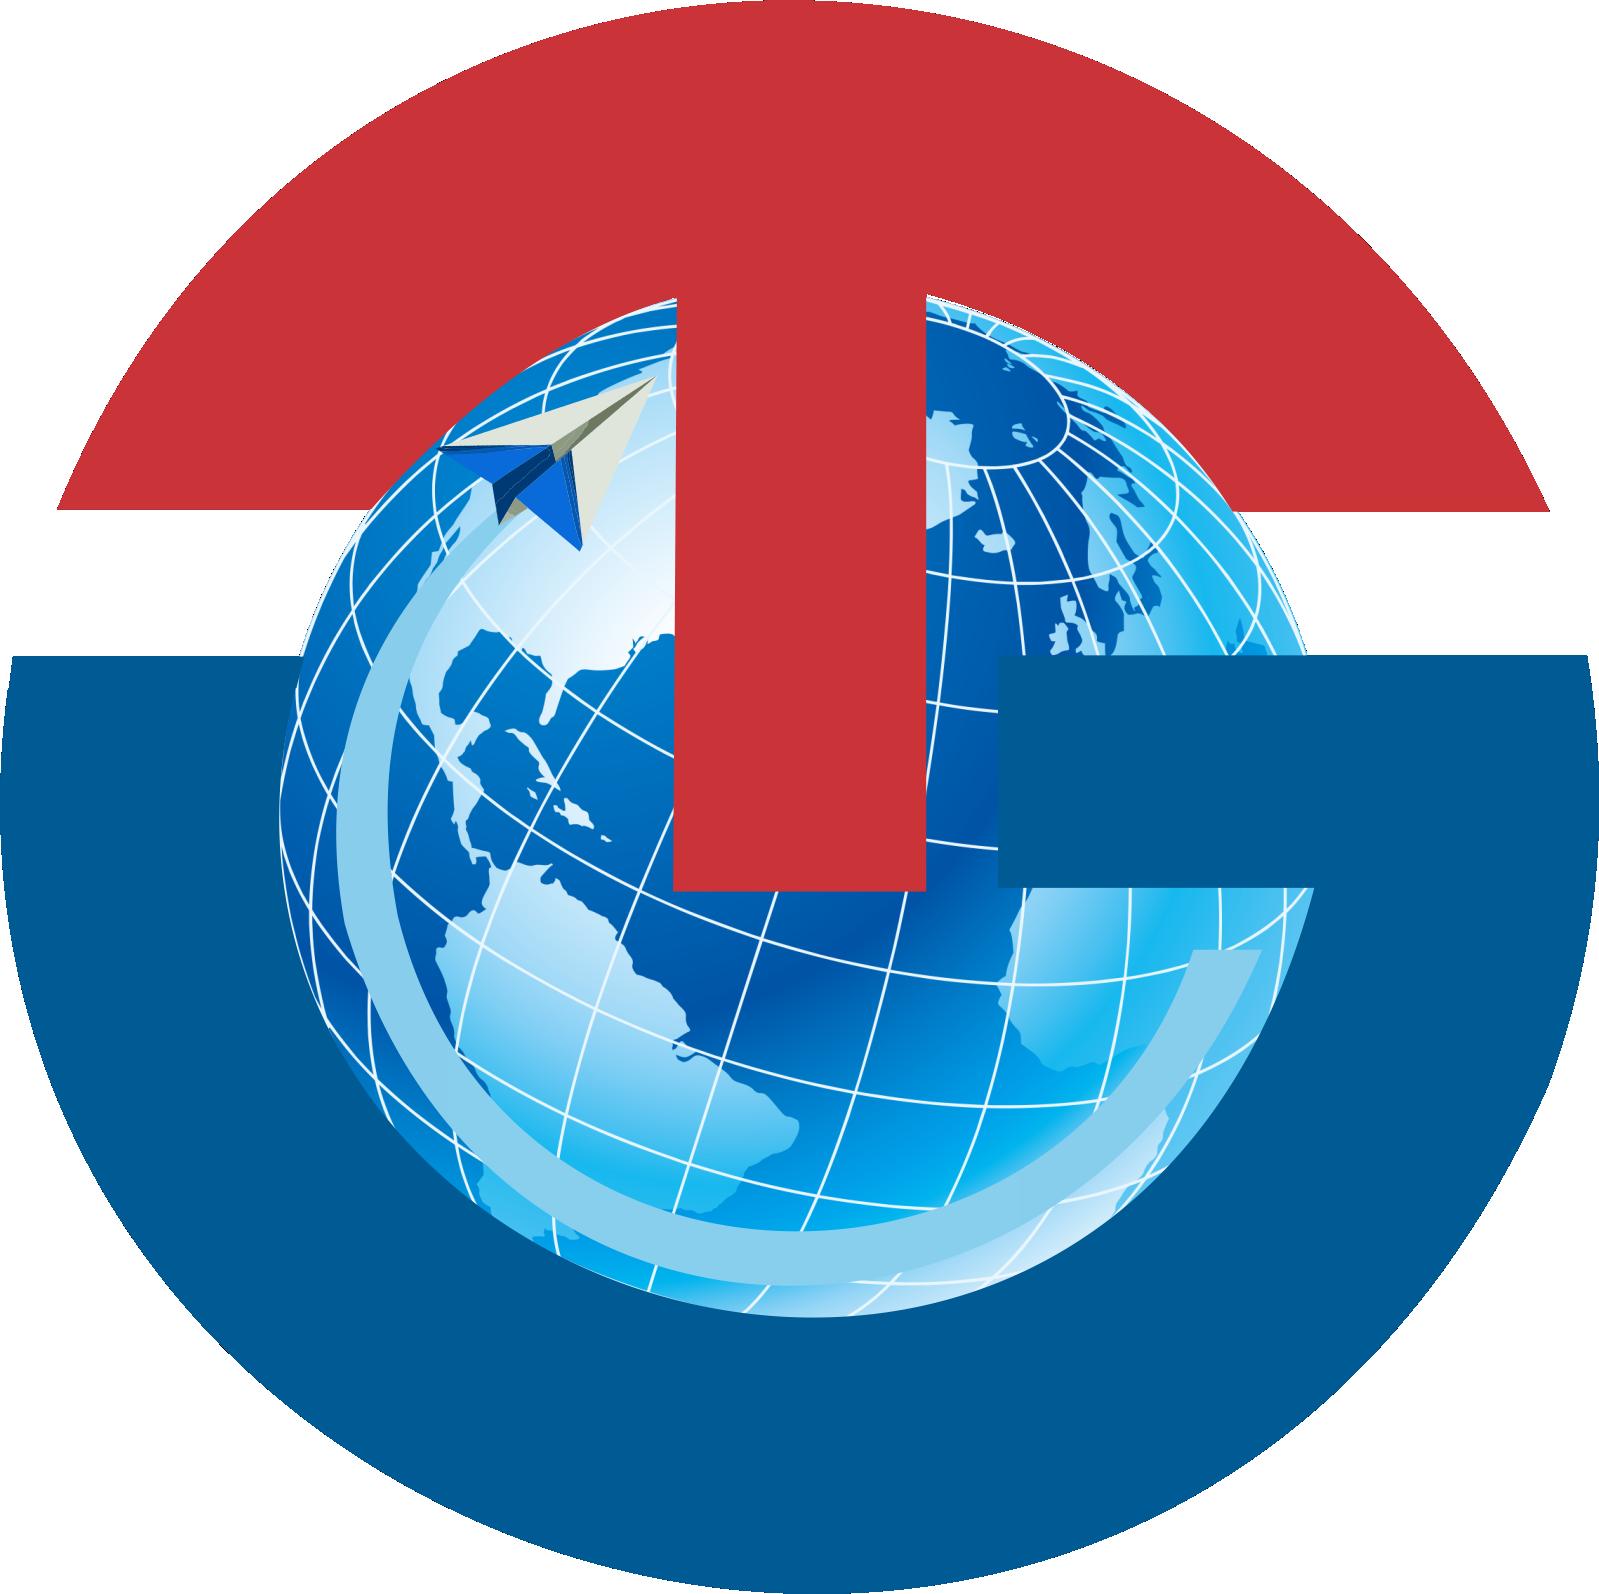 The Travel Globe